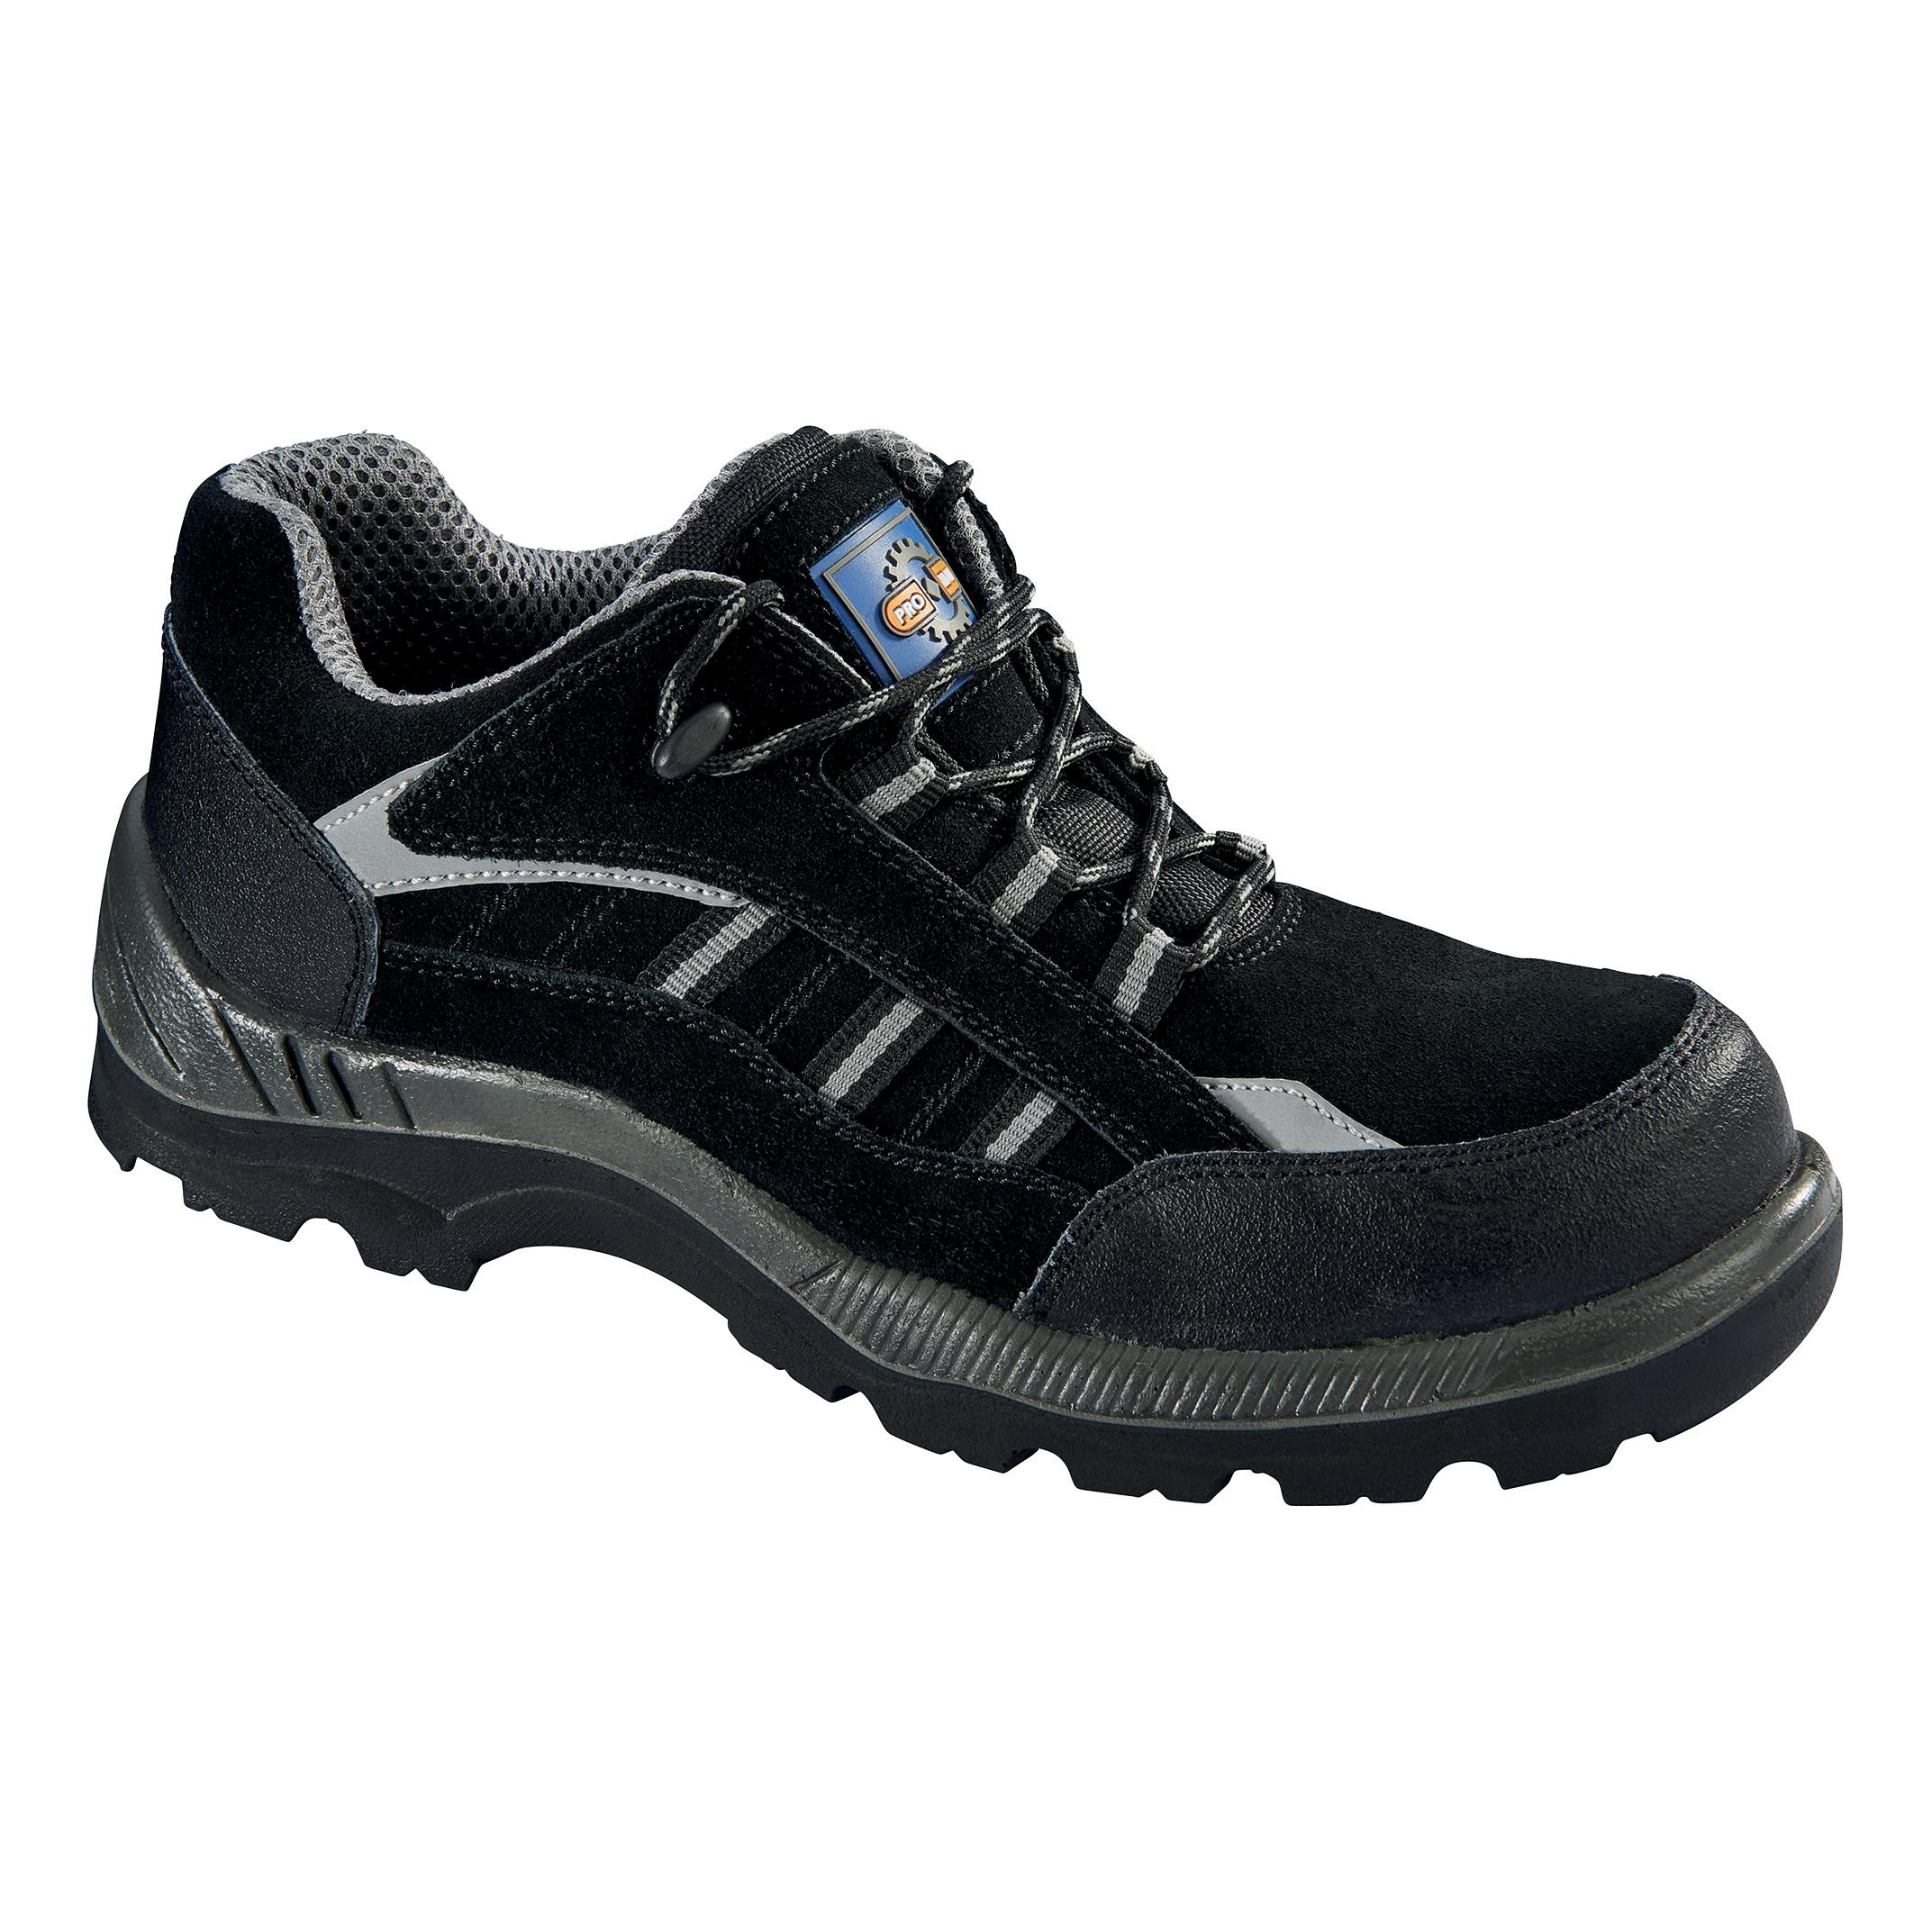 Rockfall ProMan Trainer Suede Fibreglass Toecap Black Size 7 Ref PM4040 7